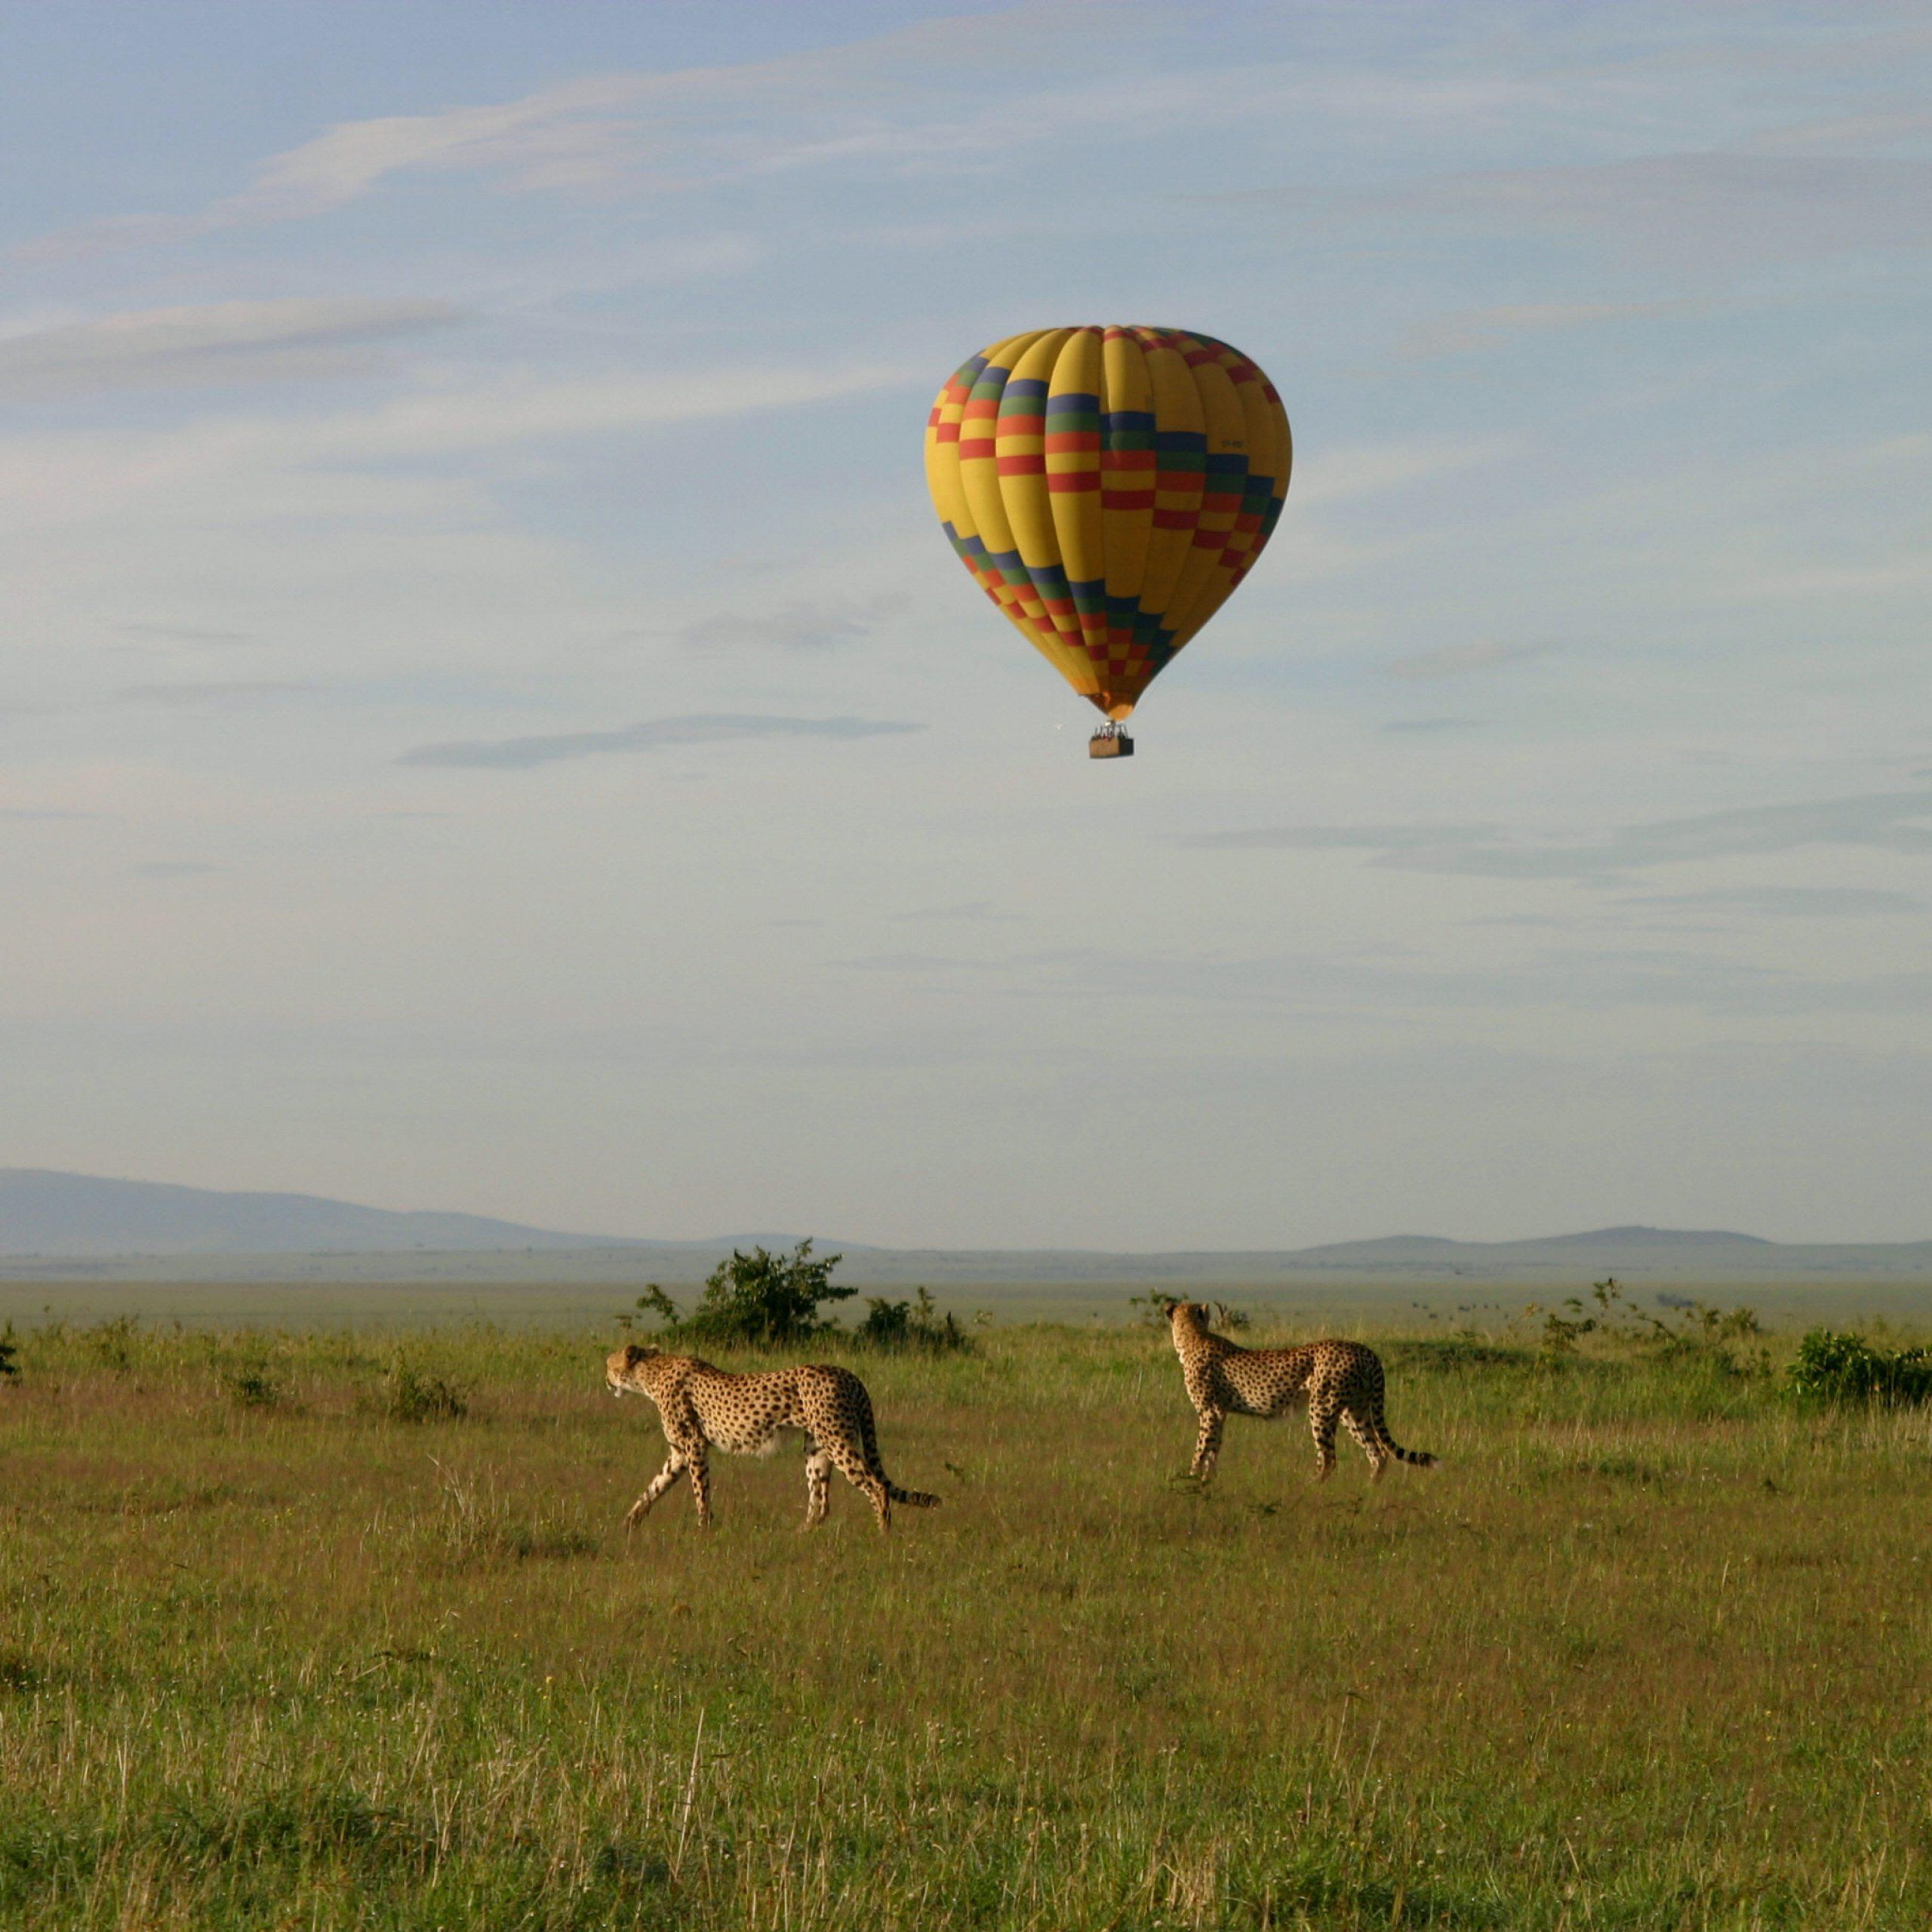 Day 6: Maasai Mara - Nairobi